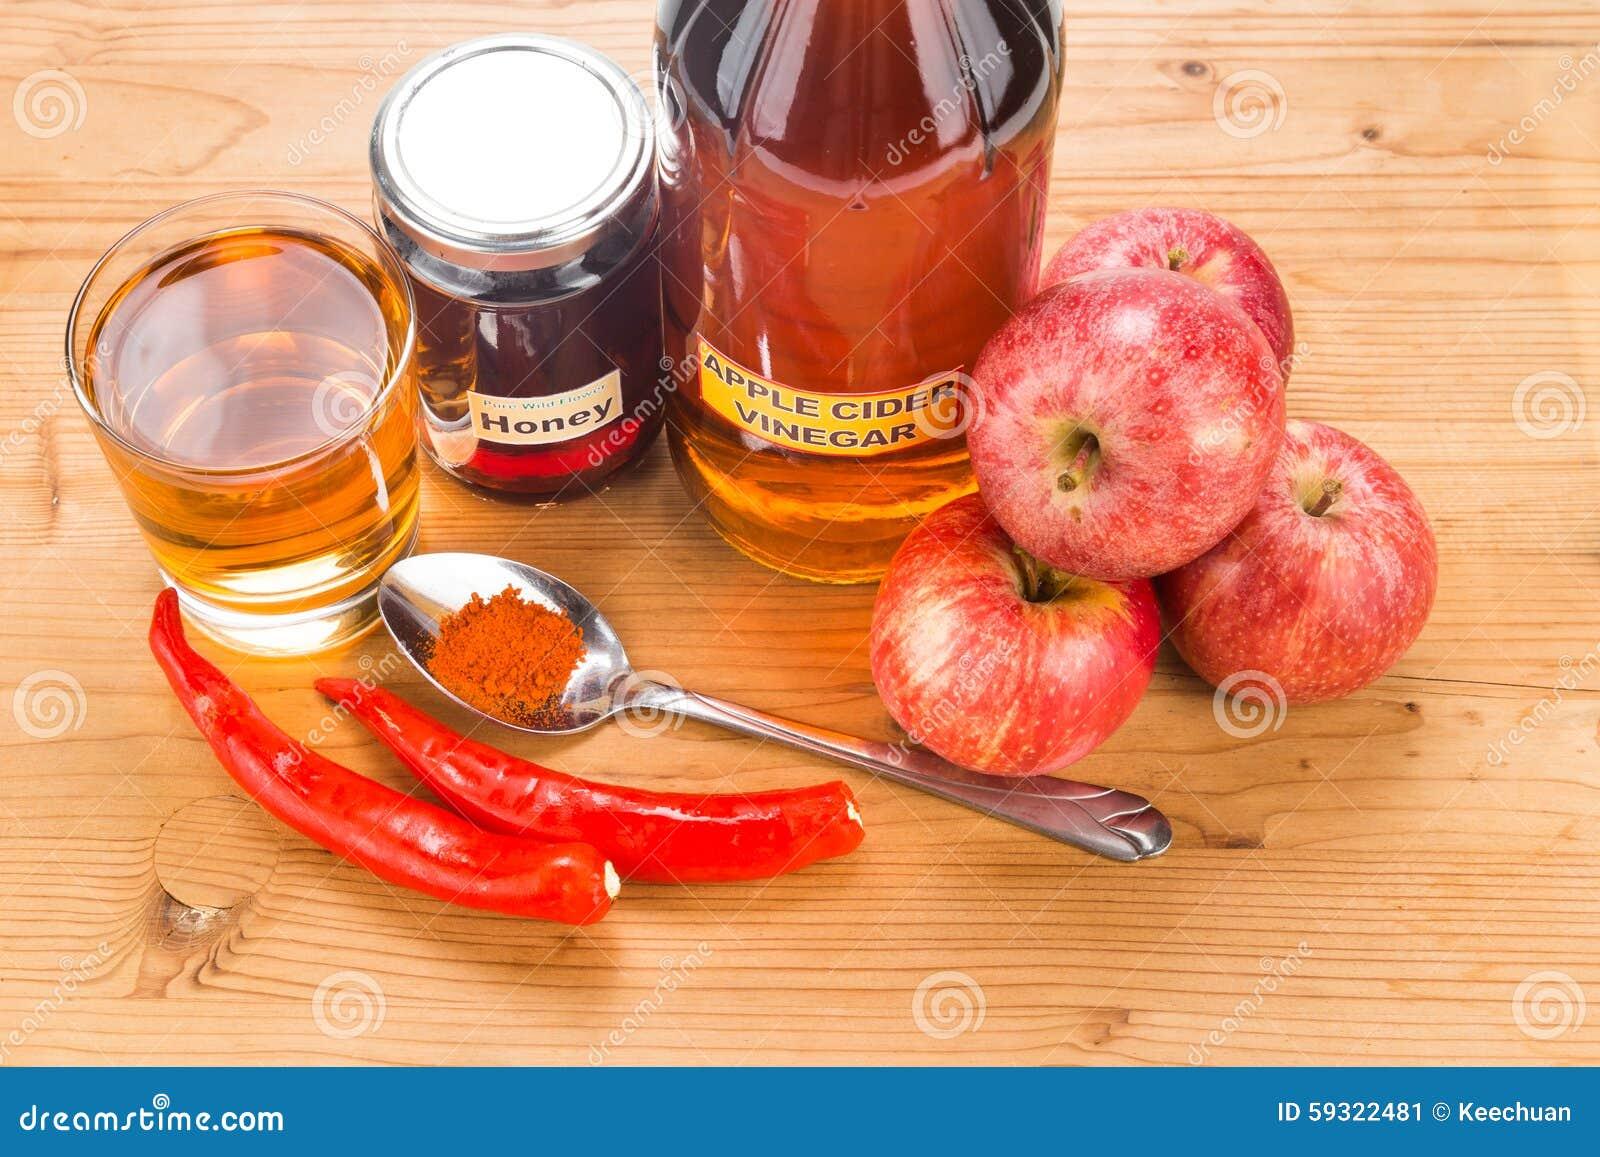 Cayenne Pepper Apple Cider Vinegar Drink